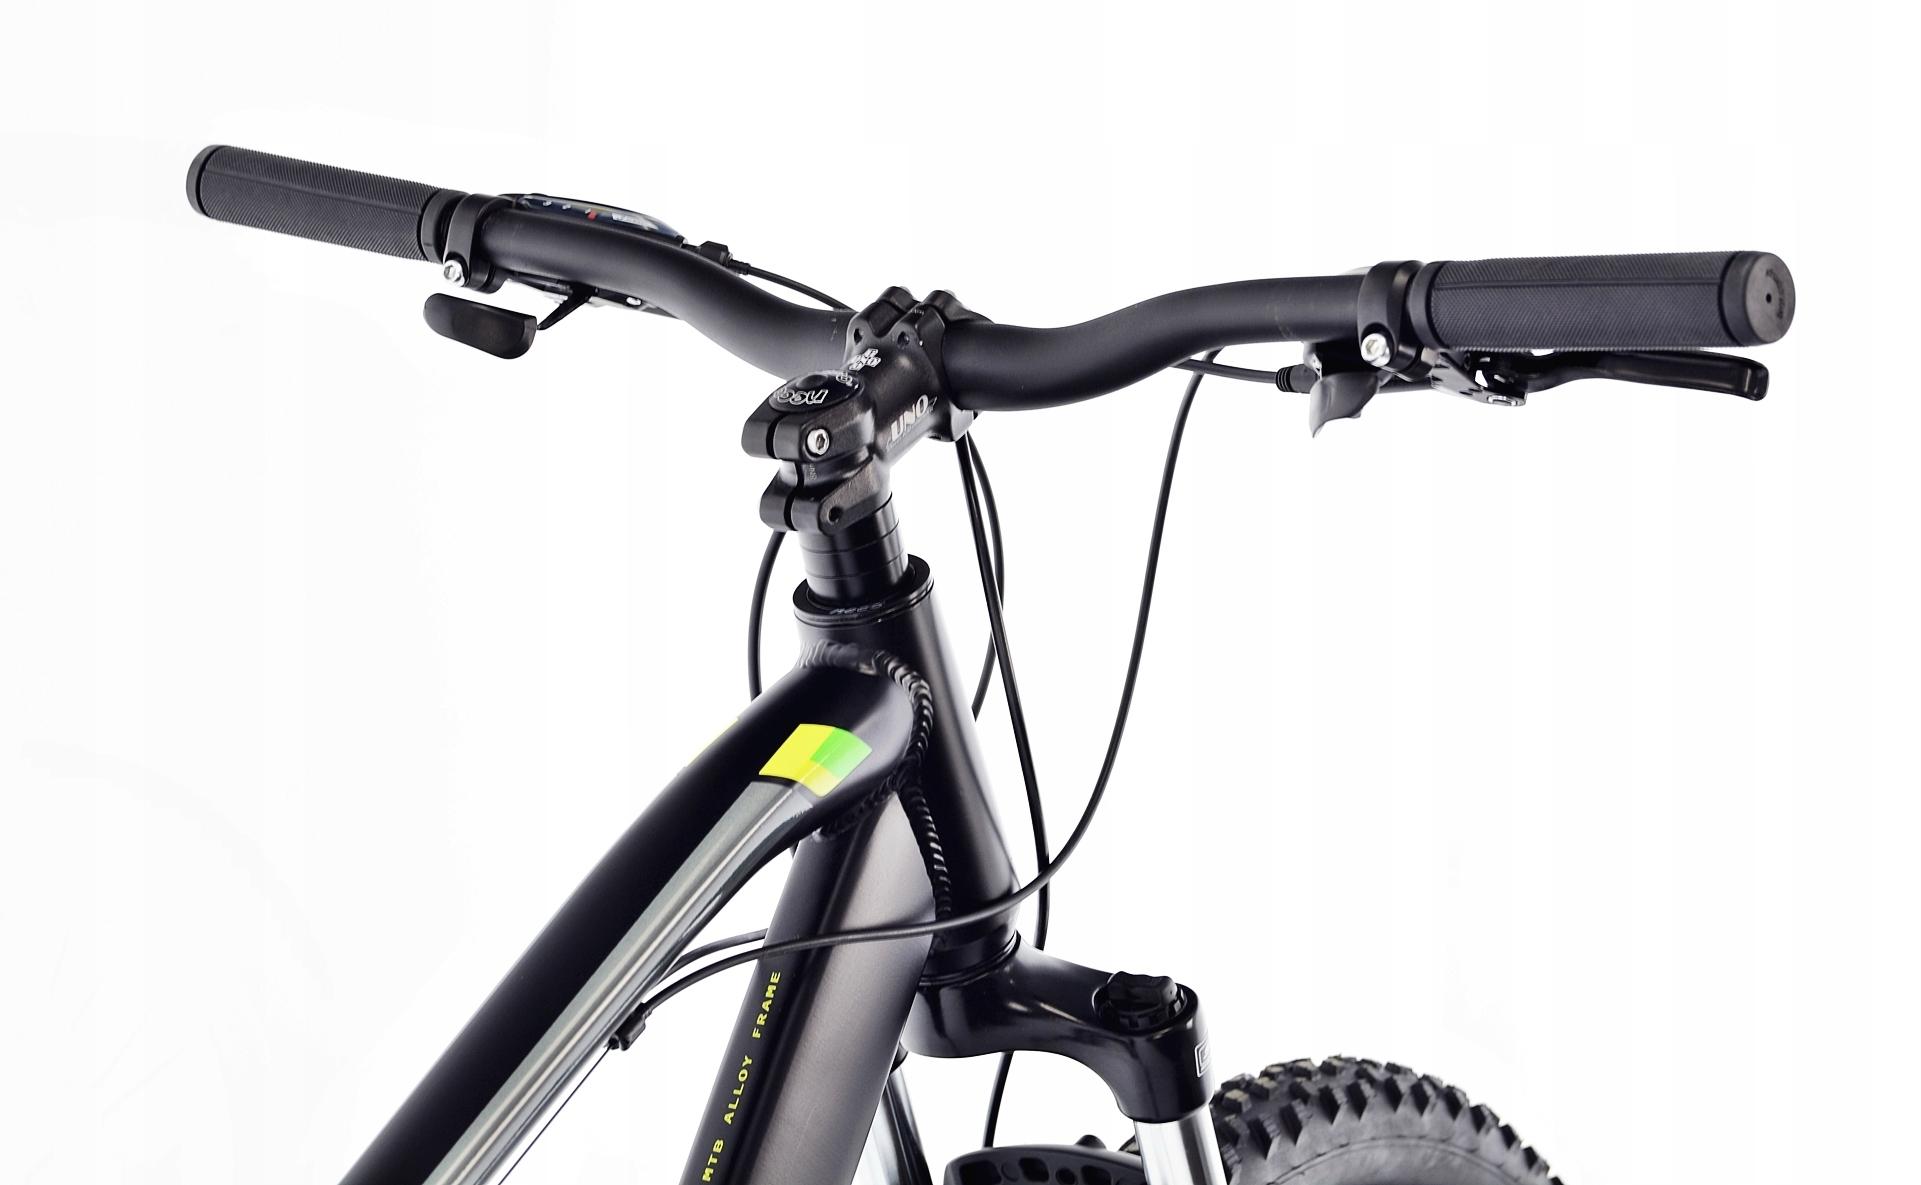 Rower MTB Kands 29 COMPER 21 czarno-seled 2021 Pedały platformowe